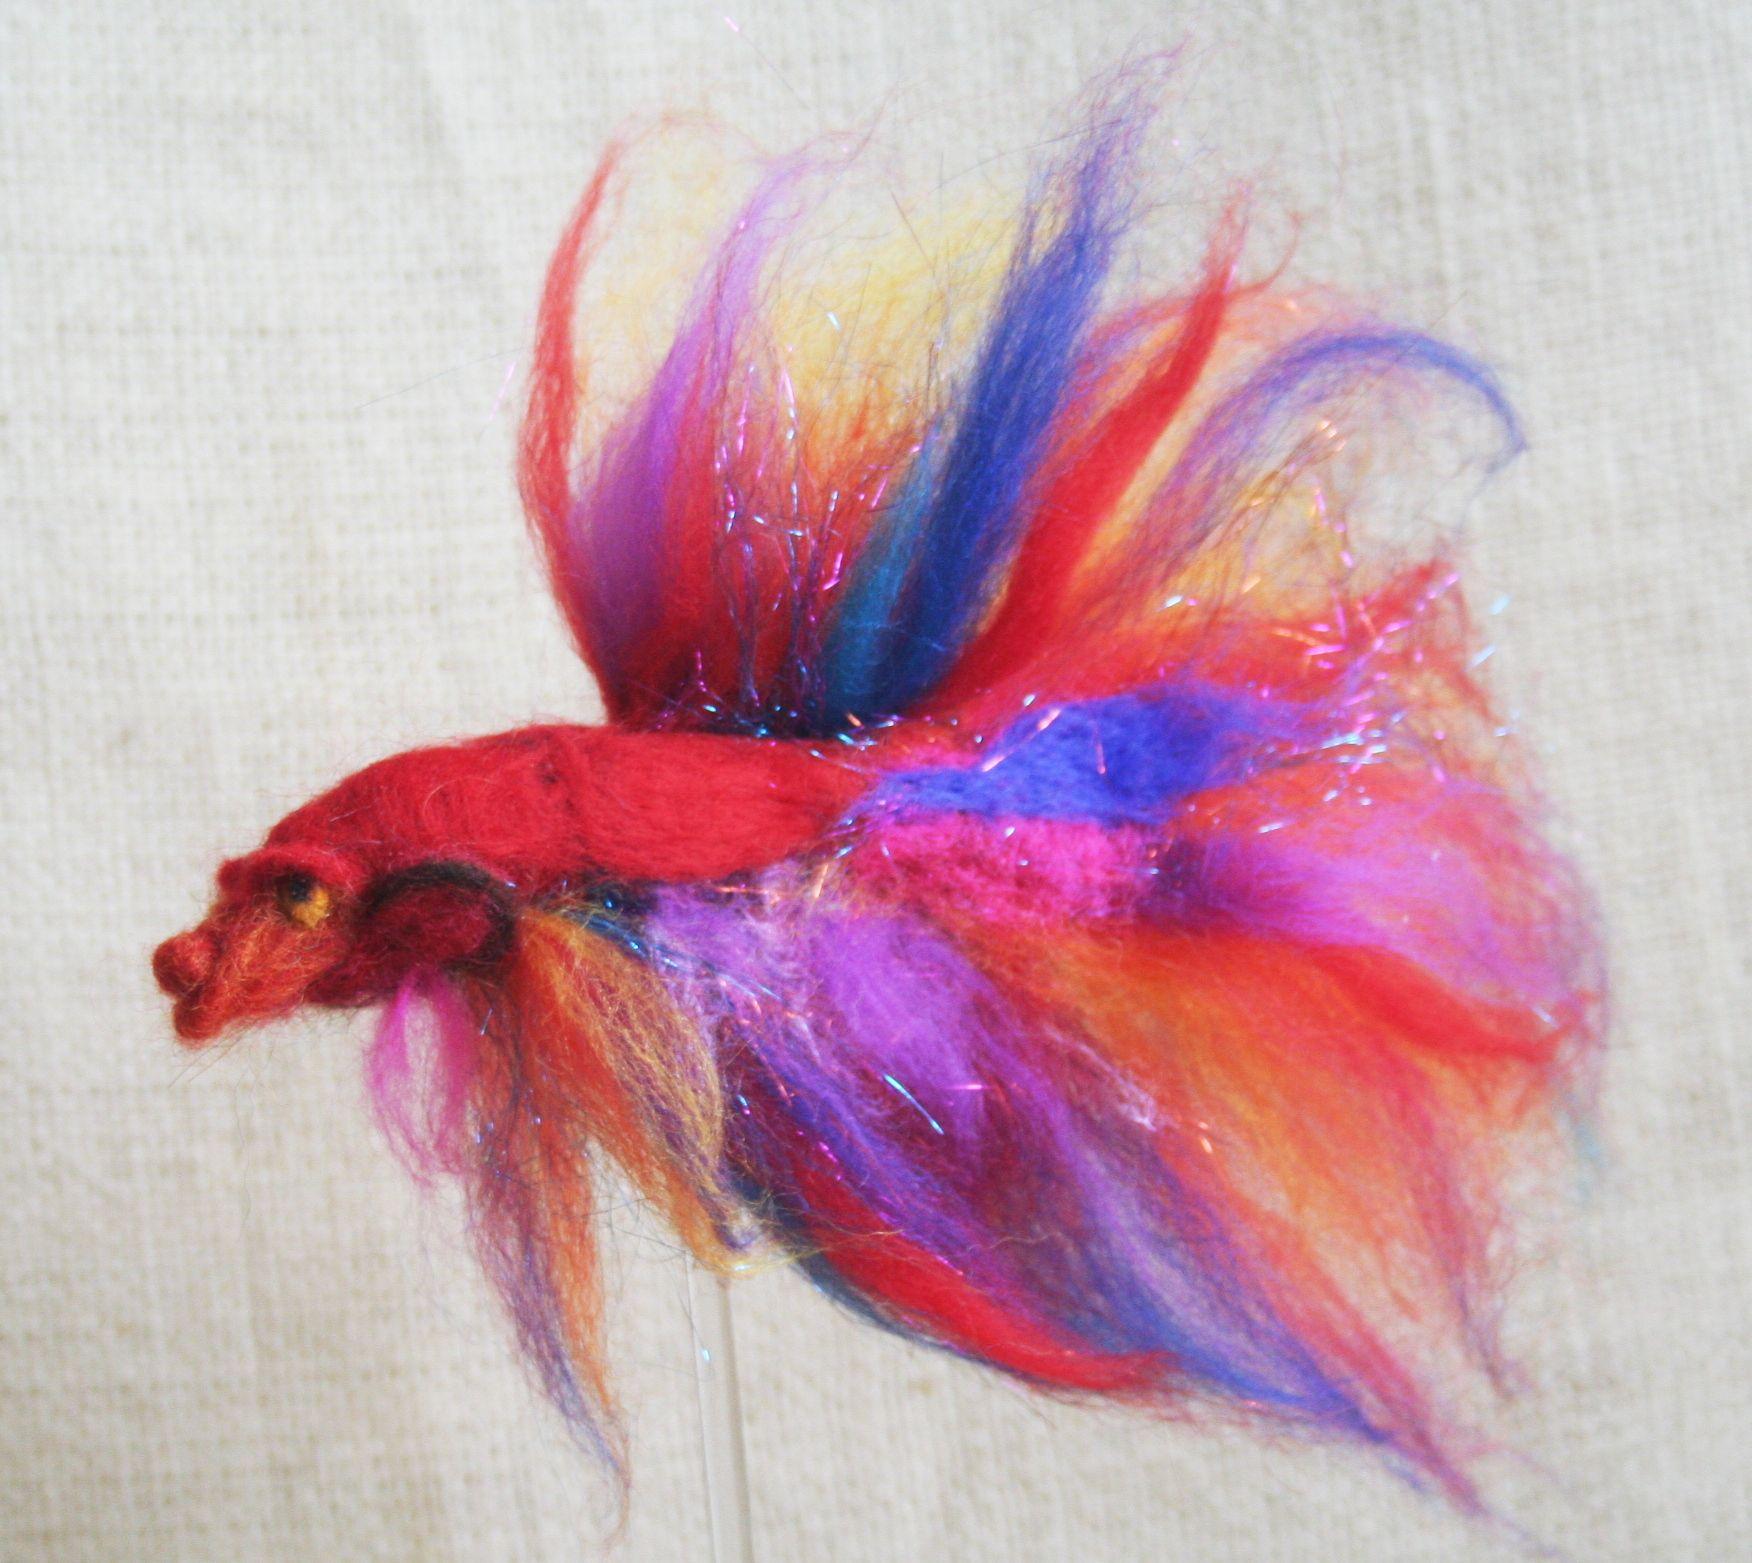 Vibrant and blazing with color, stunning lifelike betta fish; needle ...